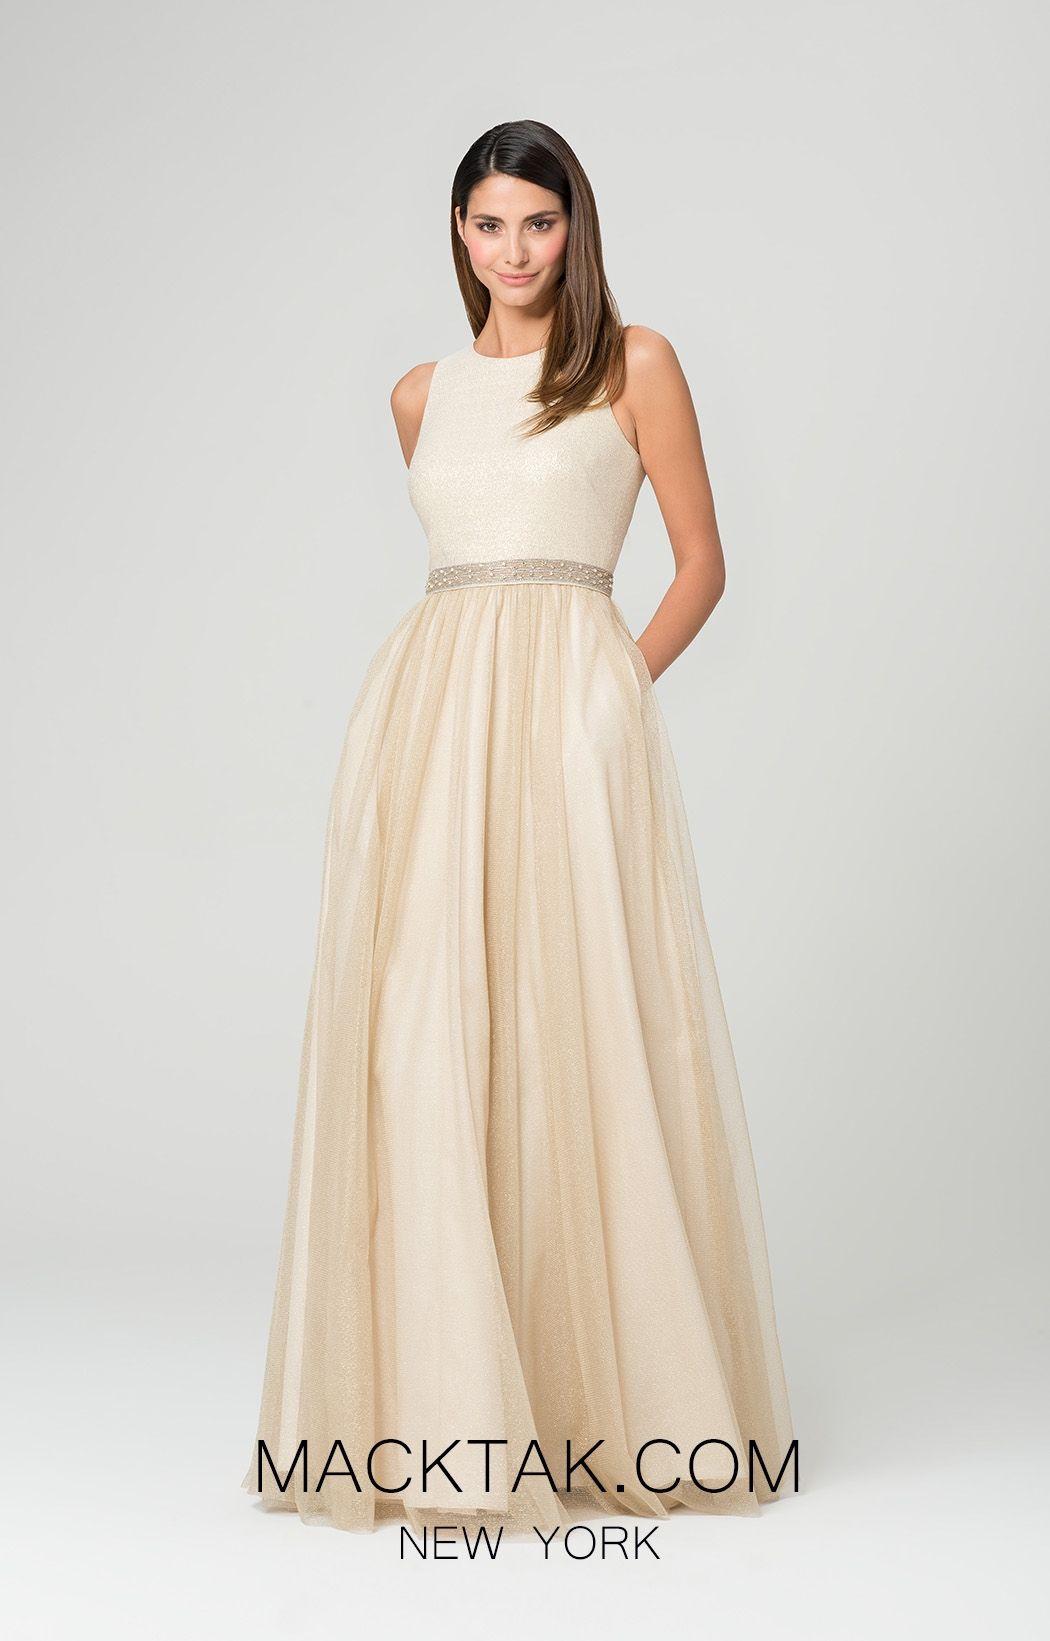 aidan mattox - Google Search | wedding | Pinterest